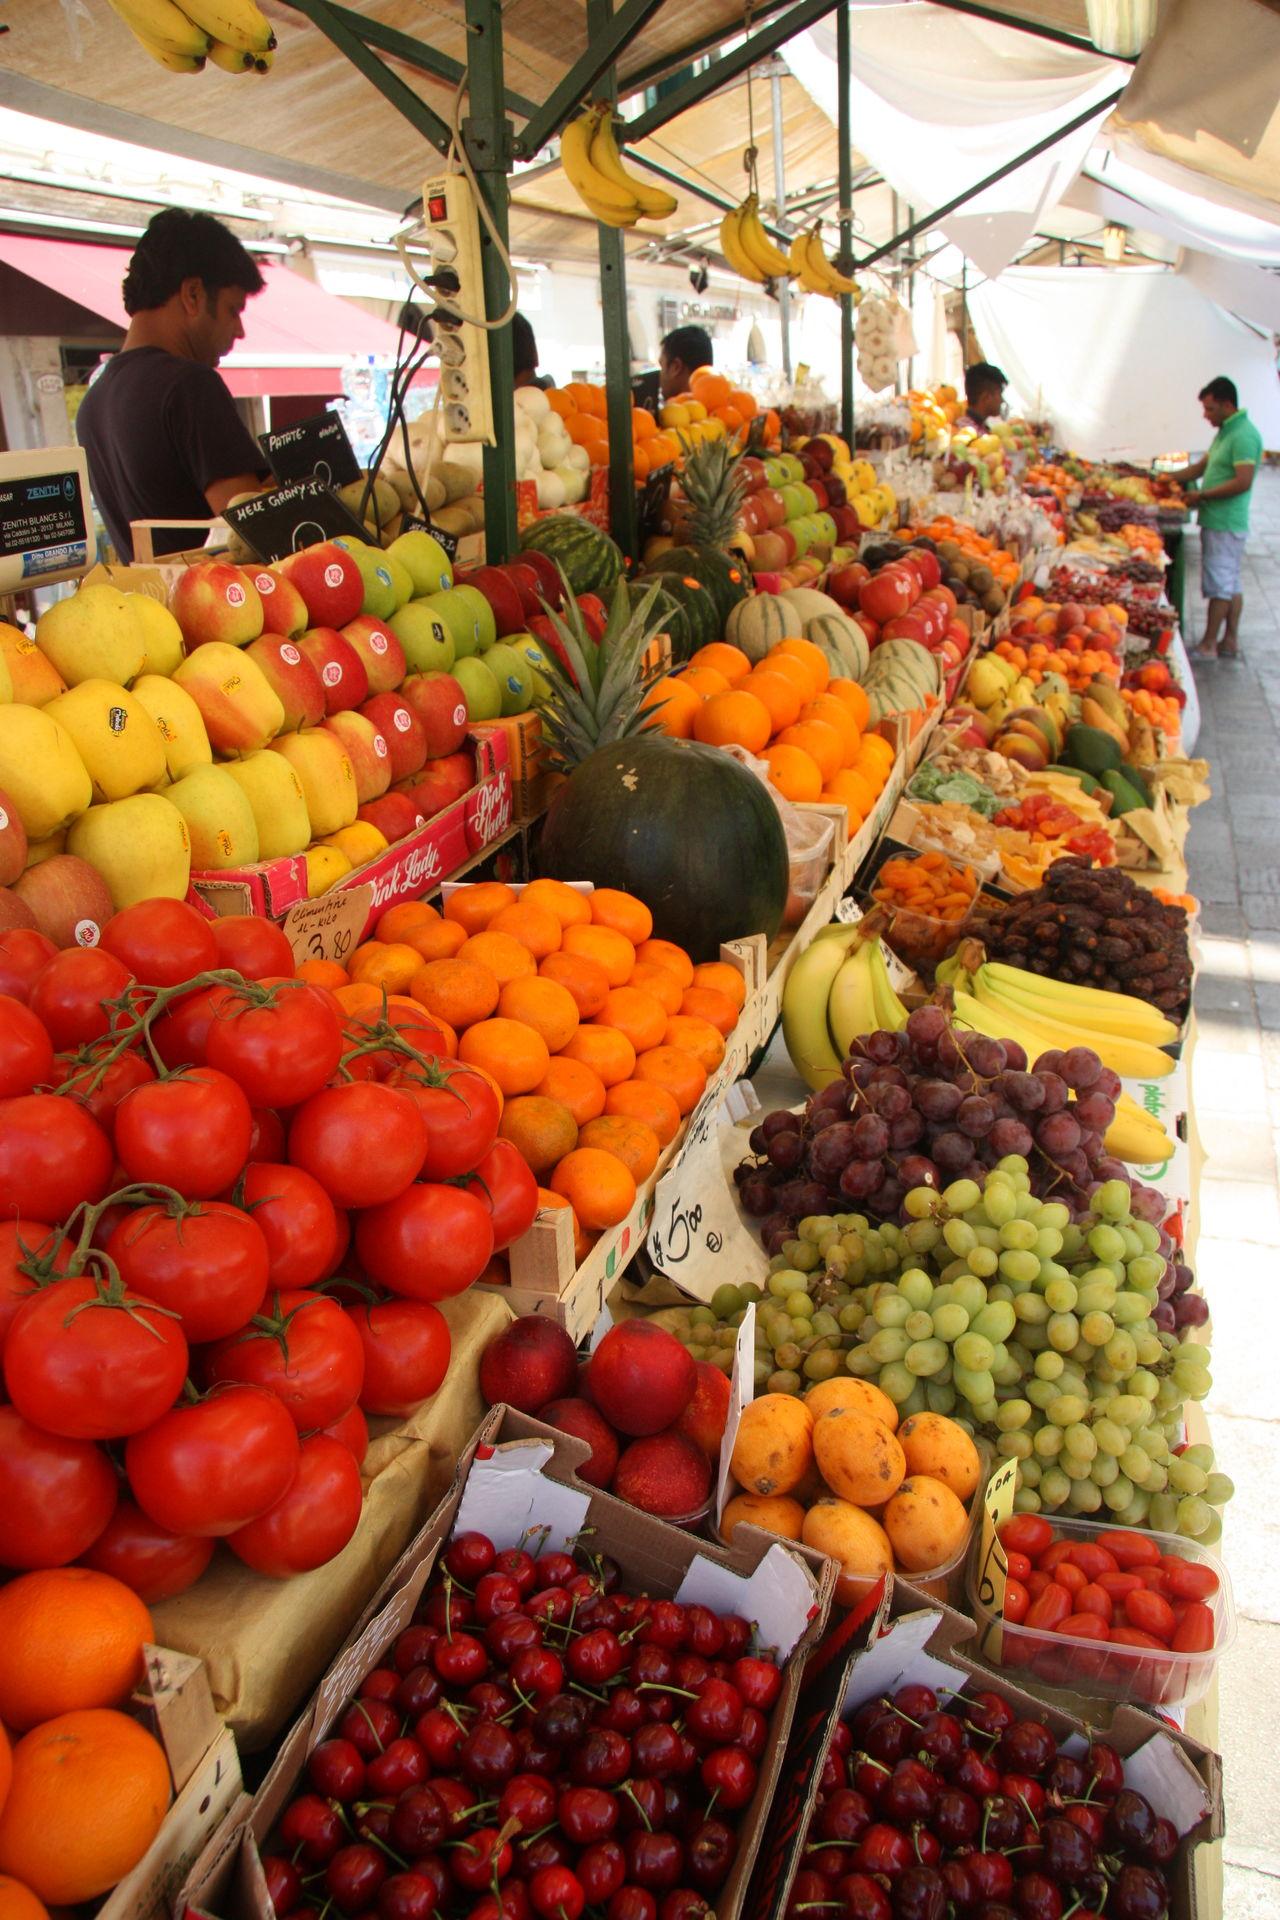 #Food #foodporn #Fresh #fruta #market Freshness Fruit Healthy Eating Order Retail  Vegetable